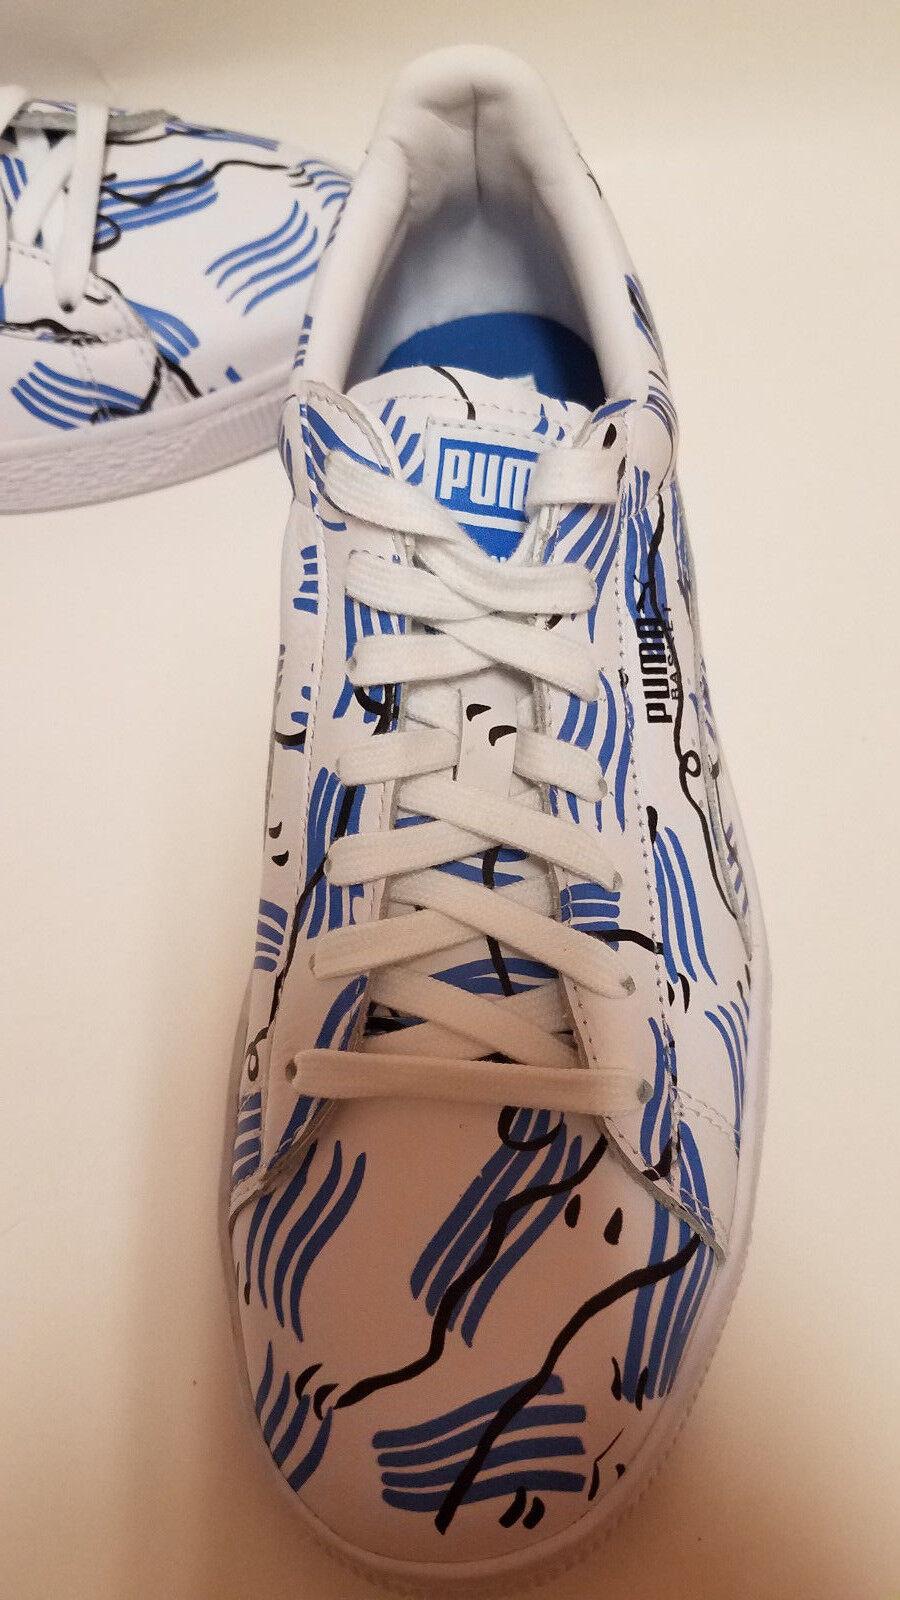 Puma X Basket Shantell scarpe Martin scarpe Shantell da ginnastica size 9.5/42.5 Uomo unisex New without box ab5402